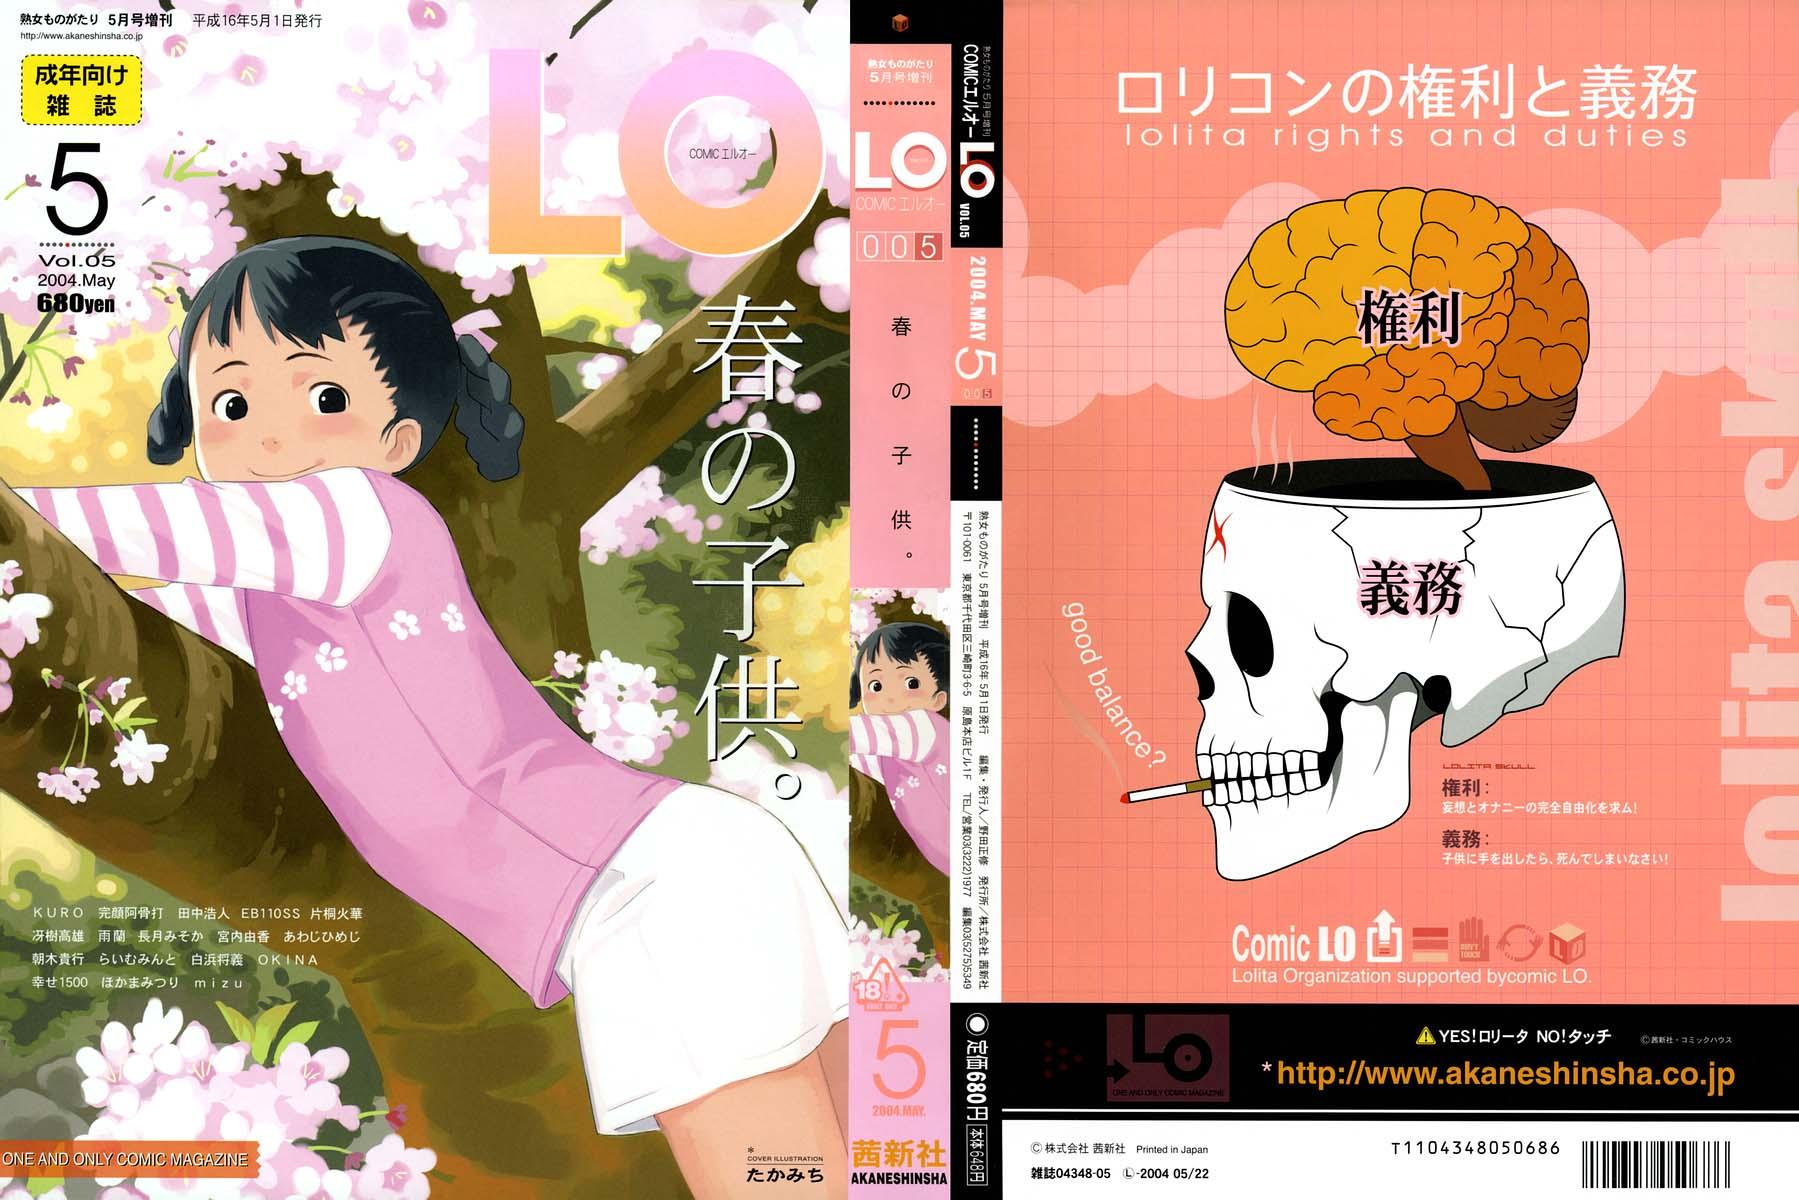 comic lo loli   konachan.com - Konachan.com Anime Wallpapers